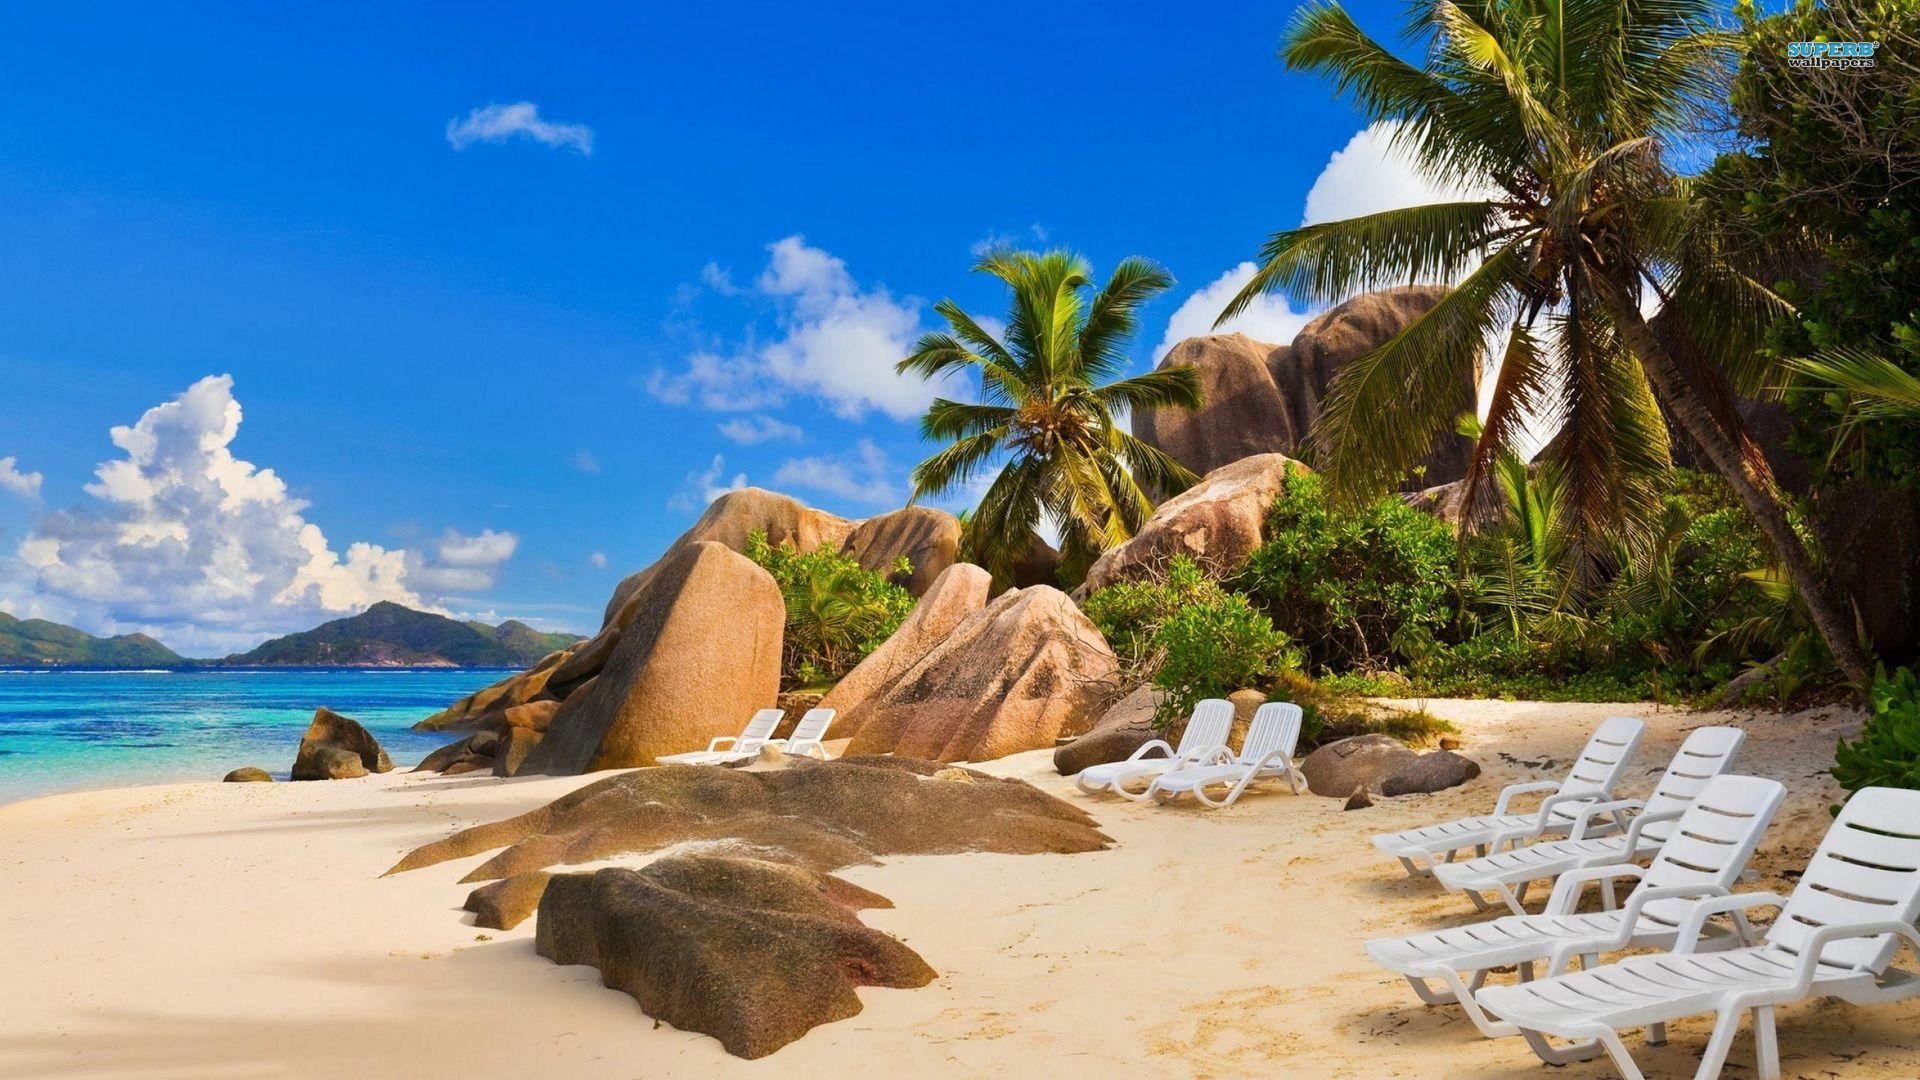 La Digue Island Wallpaper Desktop 3d Wallpapers Beach